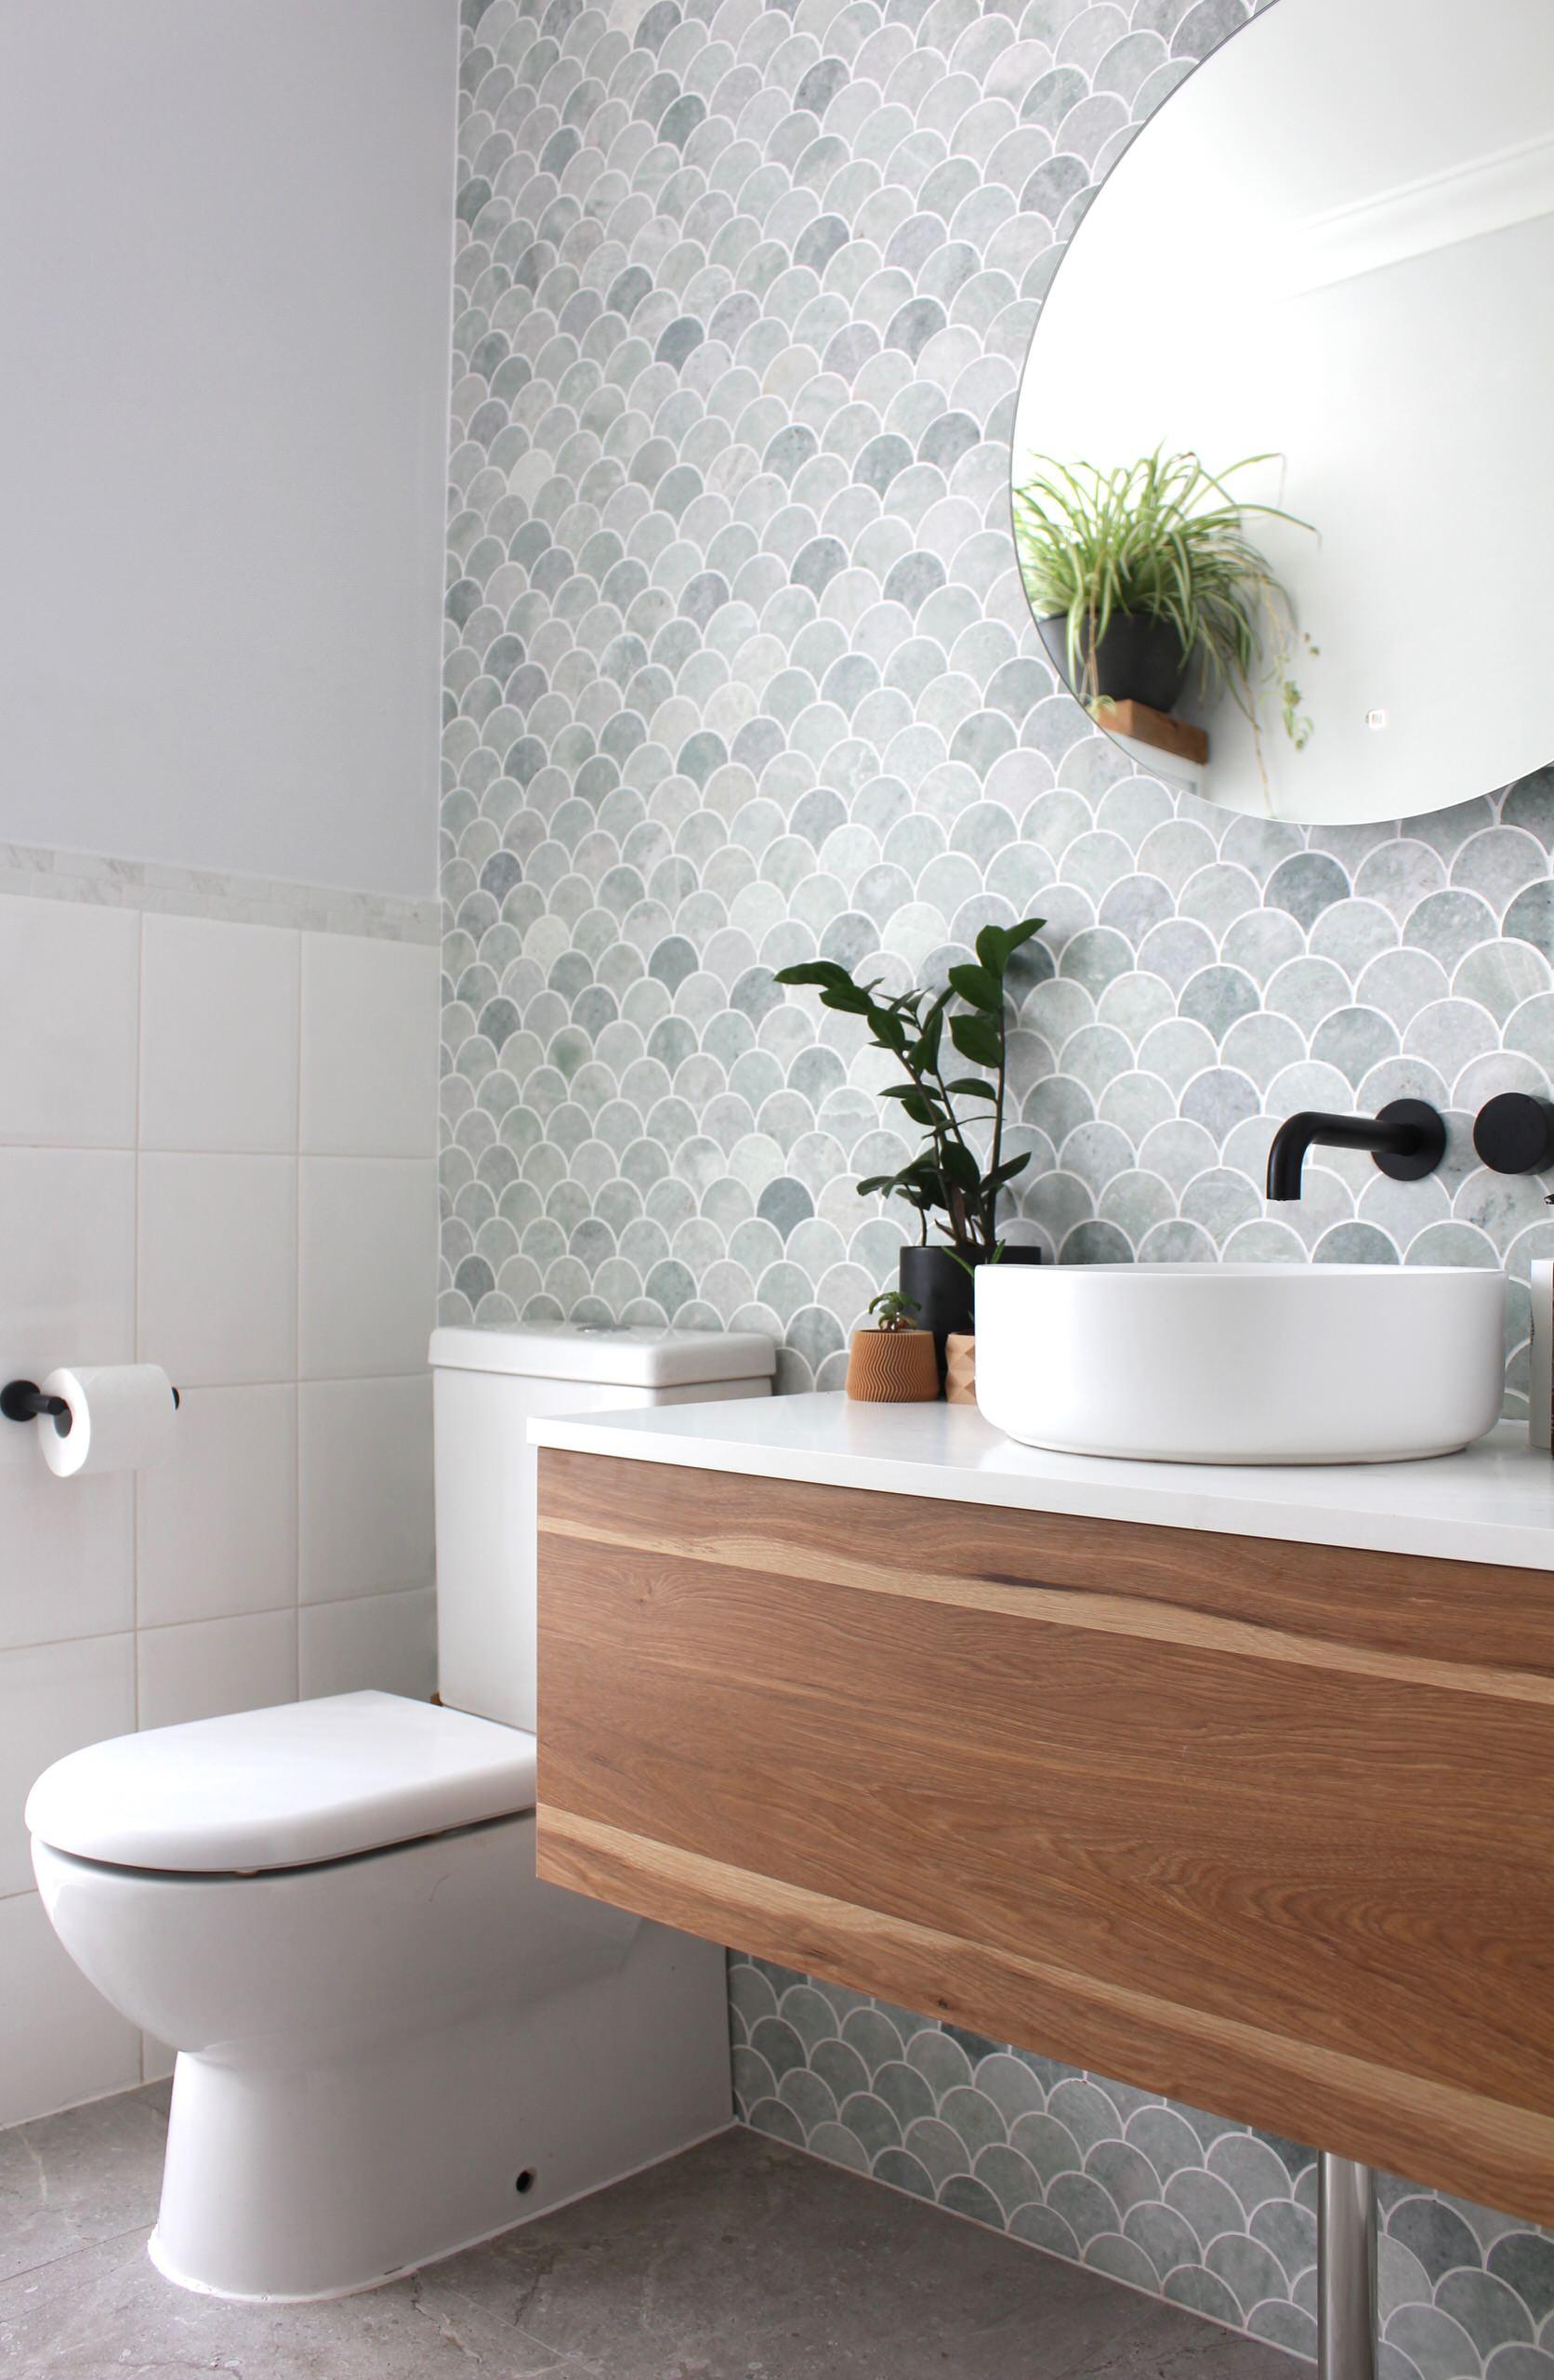 75 Beautiful Mid Century Modern Bathroom Pictures Ideas October 2020 Houzz